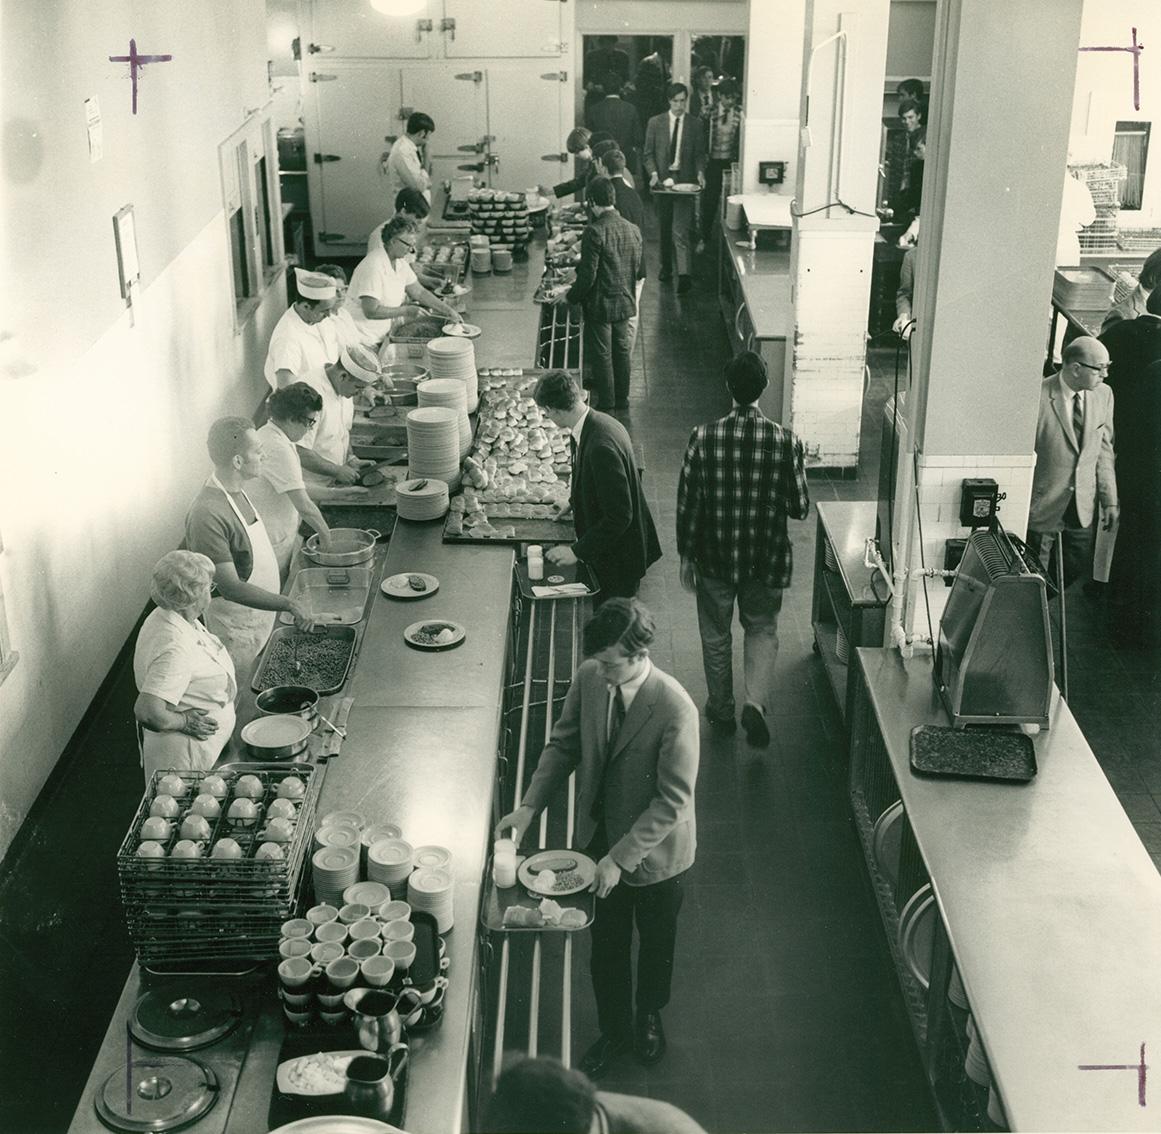 Commons, circa 1970